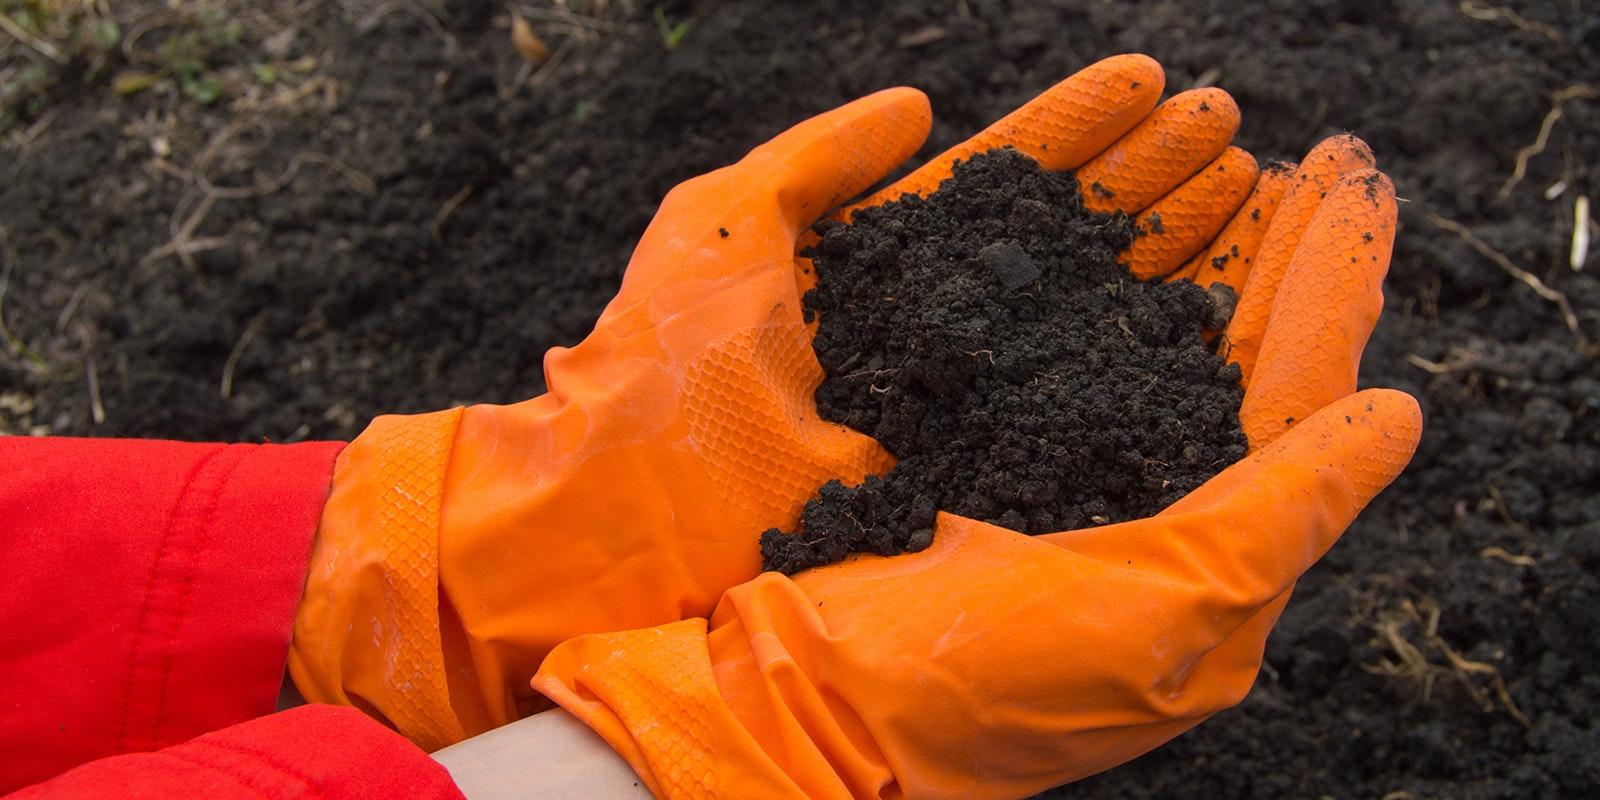 Photo Resources Contaminated Soil